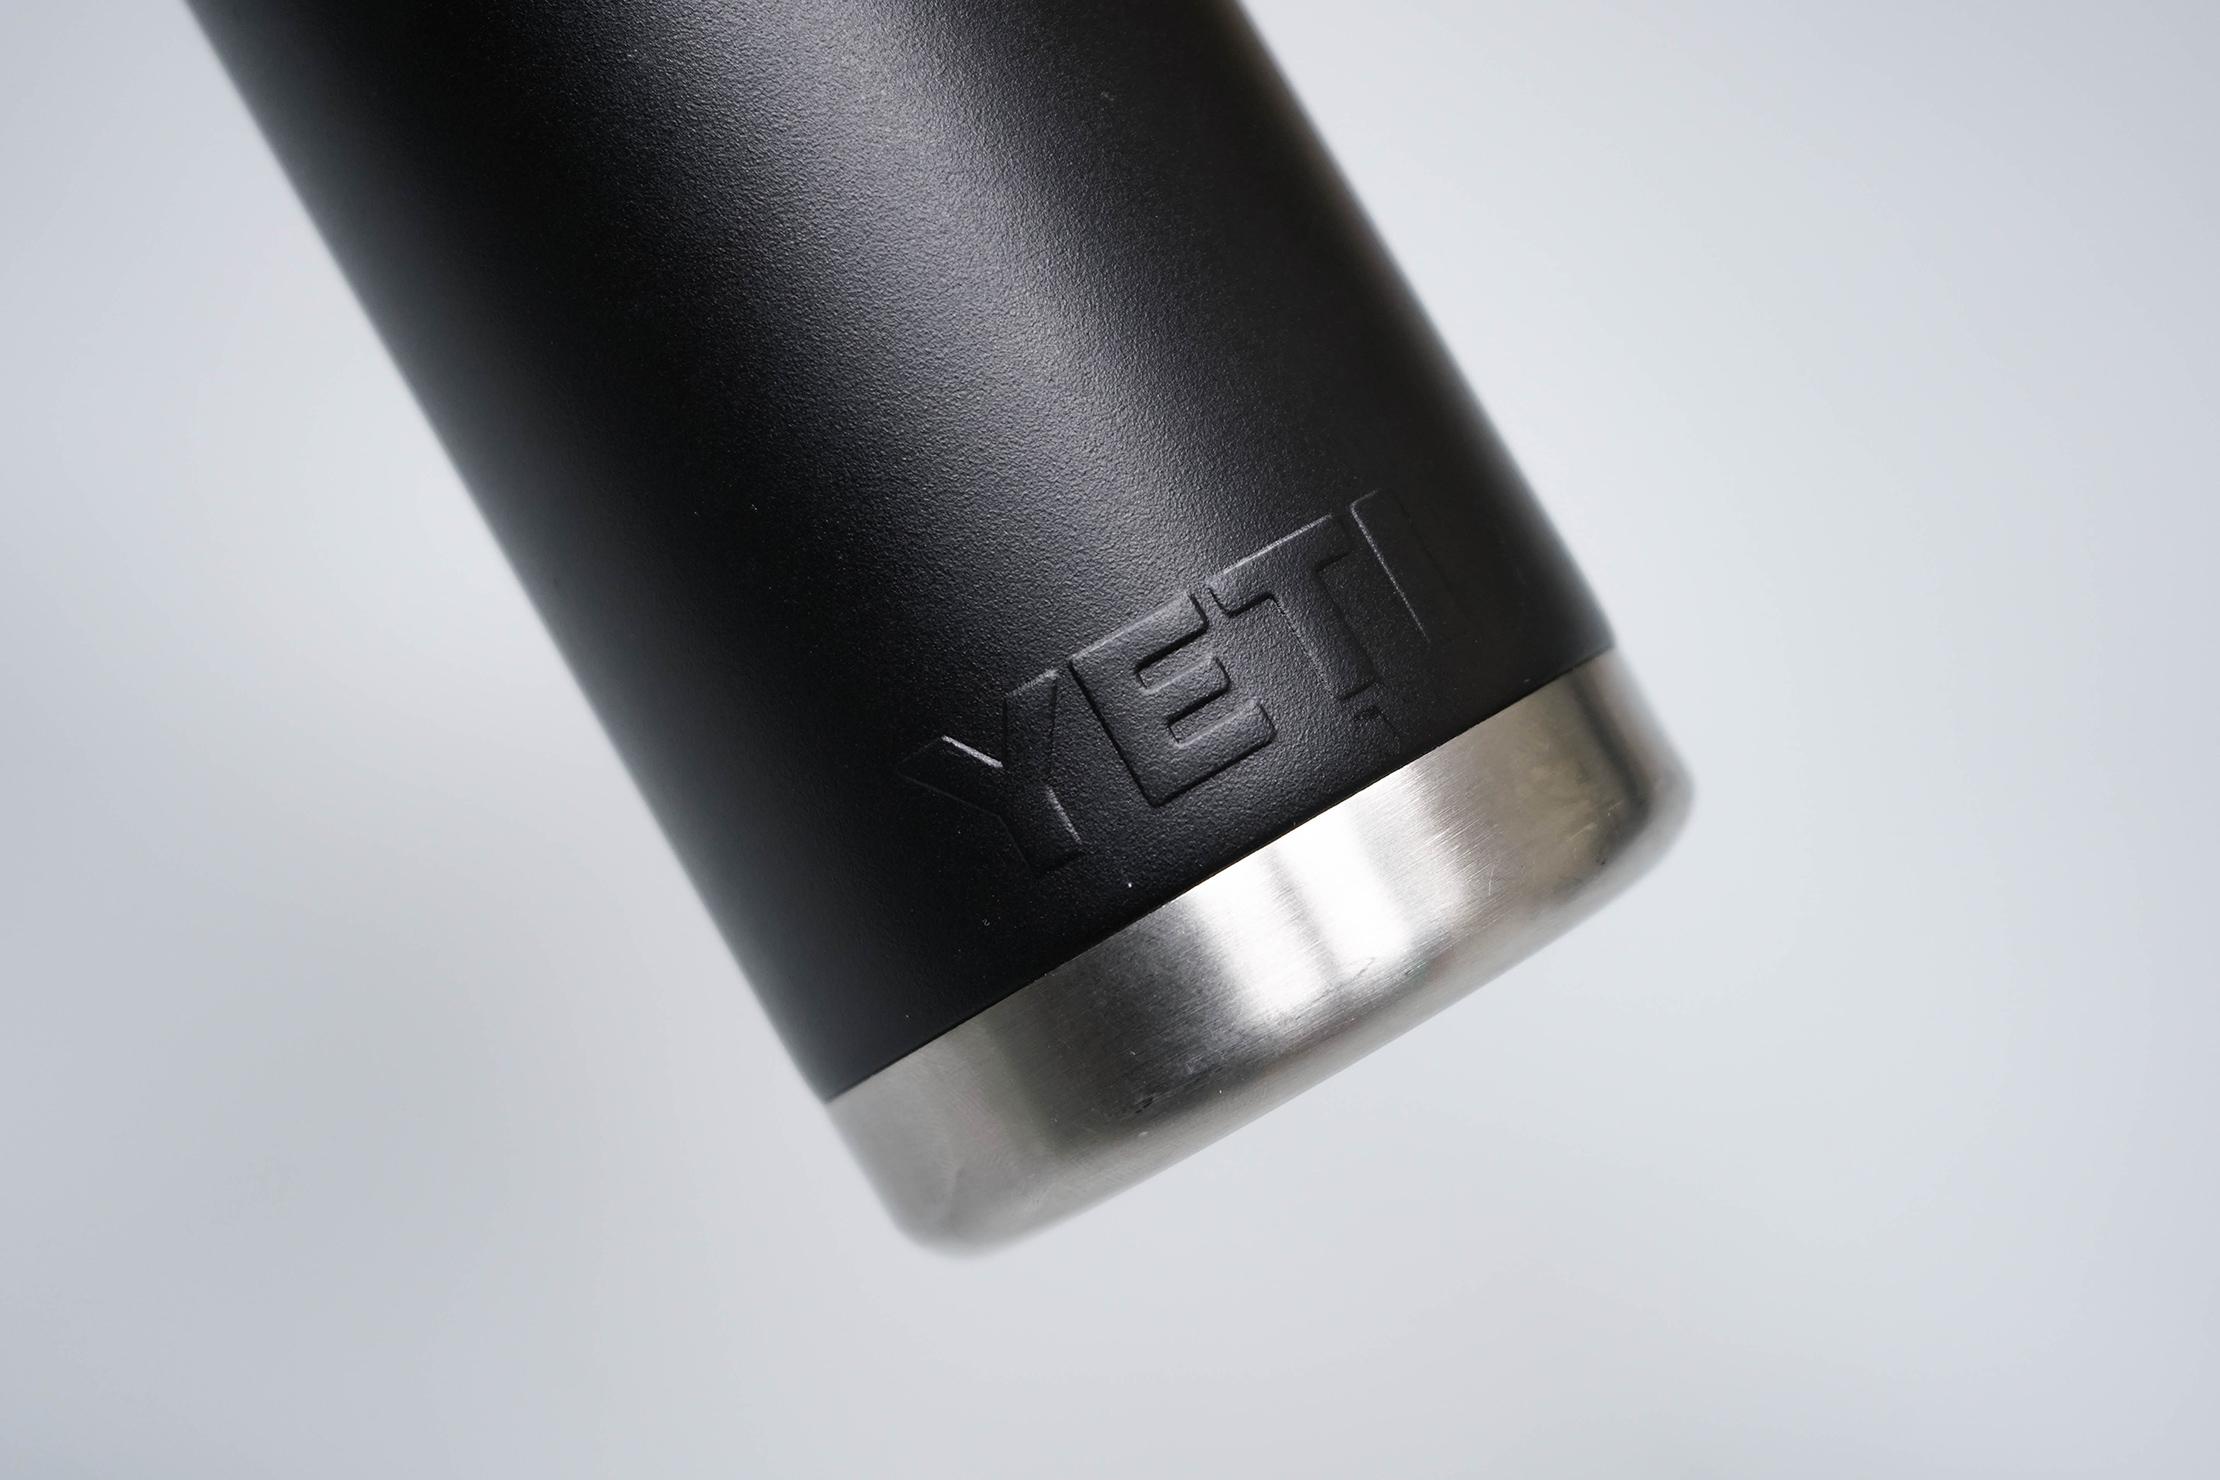 Yeti Rambler 12oz Bottle With HotShot Cap Body